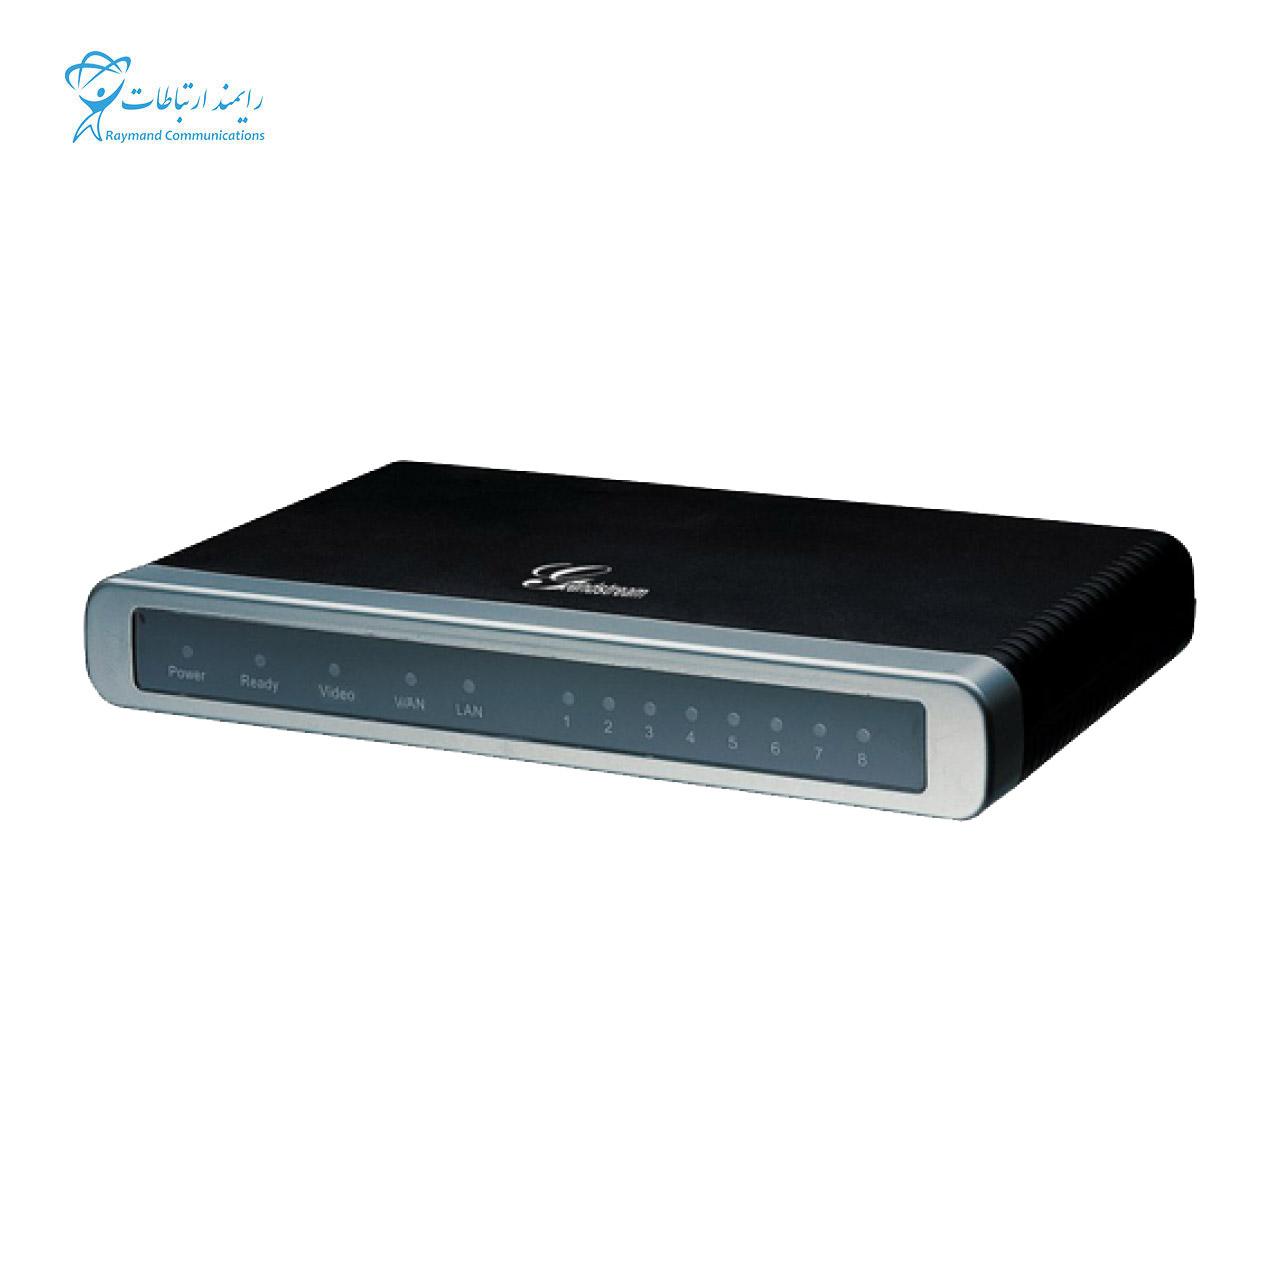 تصویر گیت وی تلفن آنالوگ به آی پی (FXO) گرنداستریم Grandstream GXW4108 Grandstream GXW4108 Analog IP Phone (FXO) Gateway